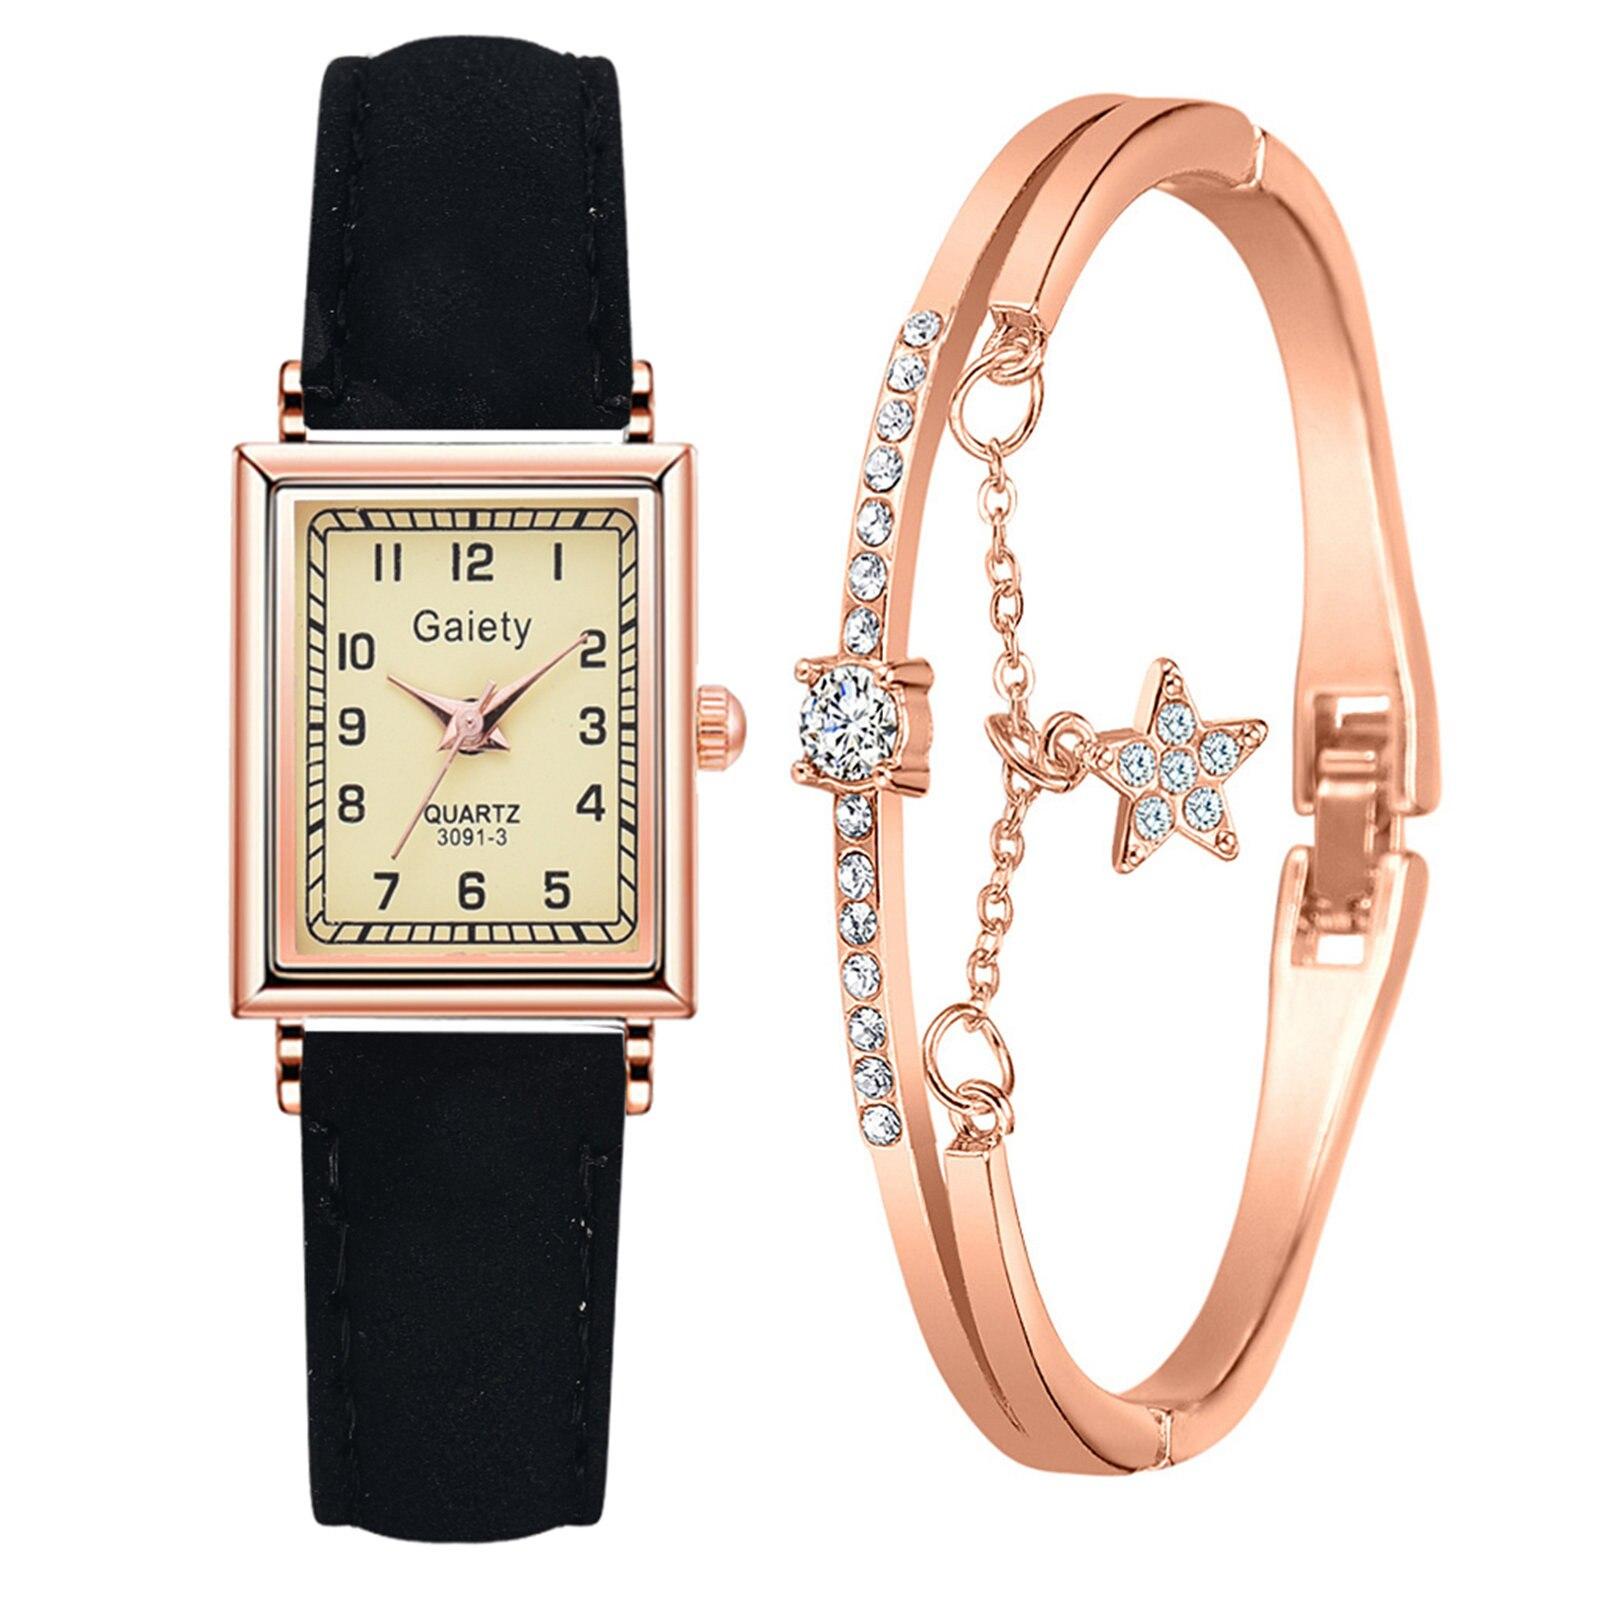 Fashion Women Watch Luxury Rose Gold Watches Leather strap Ladies Casual Watch With Bracelet Jewelry часы женские наручные W1 часы наручные женские taya цвет черный t w 0065 watch gl black